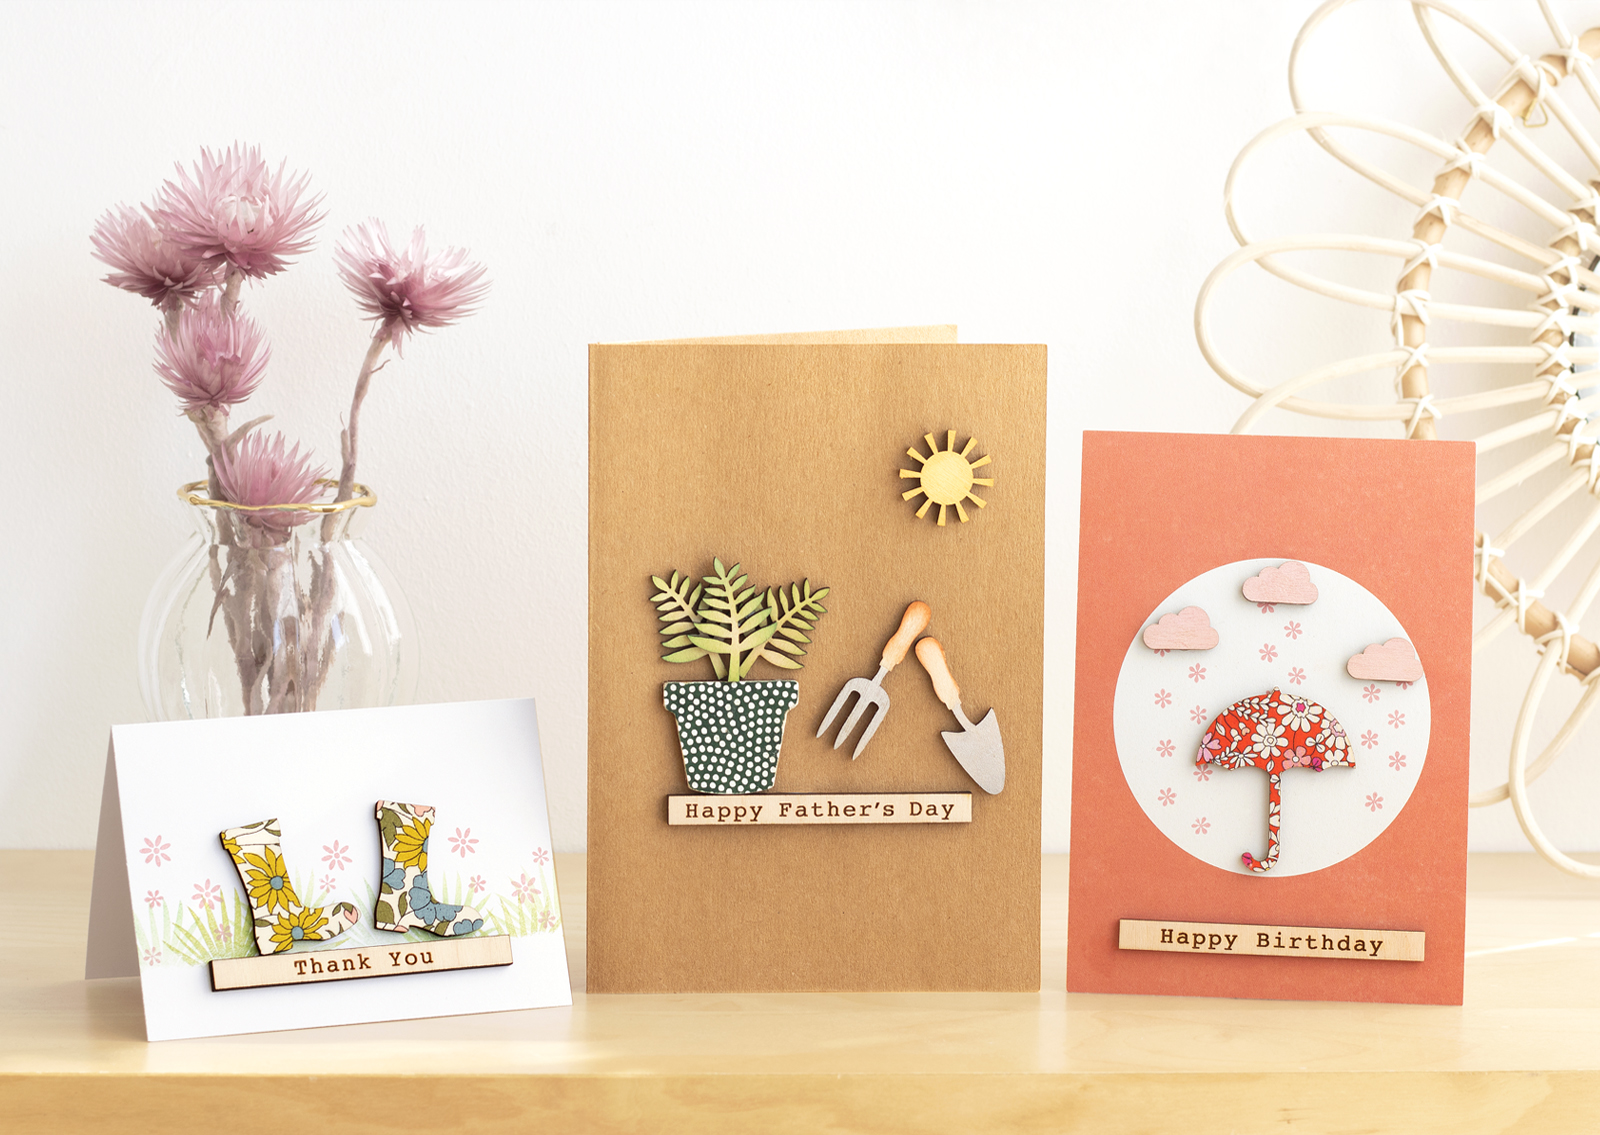 Handmade Spring cards